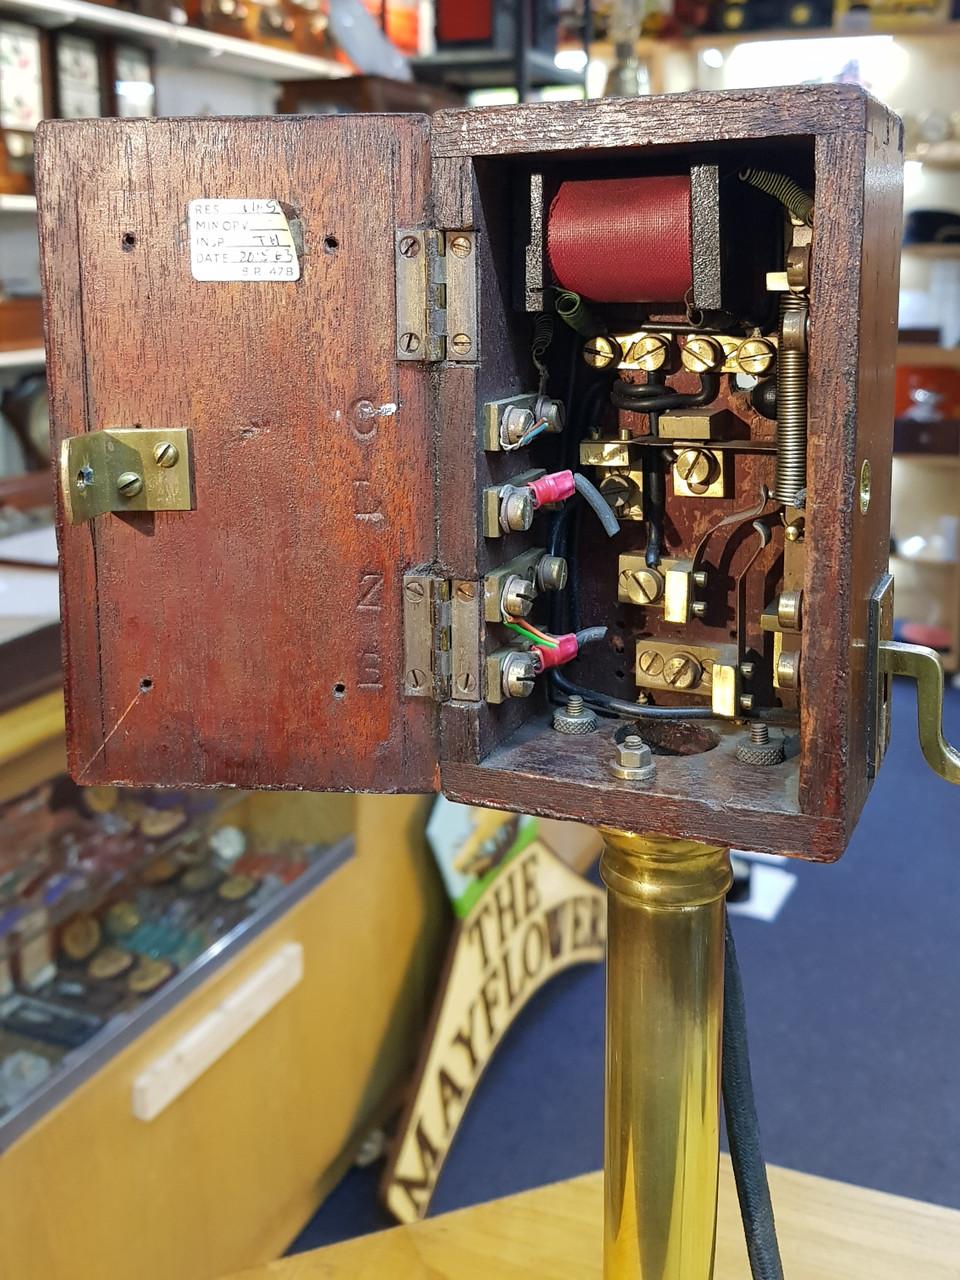 VT 3147. MIDLAND RAILWAY SIGNAL BOX CANDLE STICK TELEPHONE.